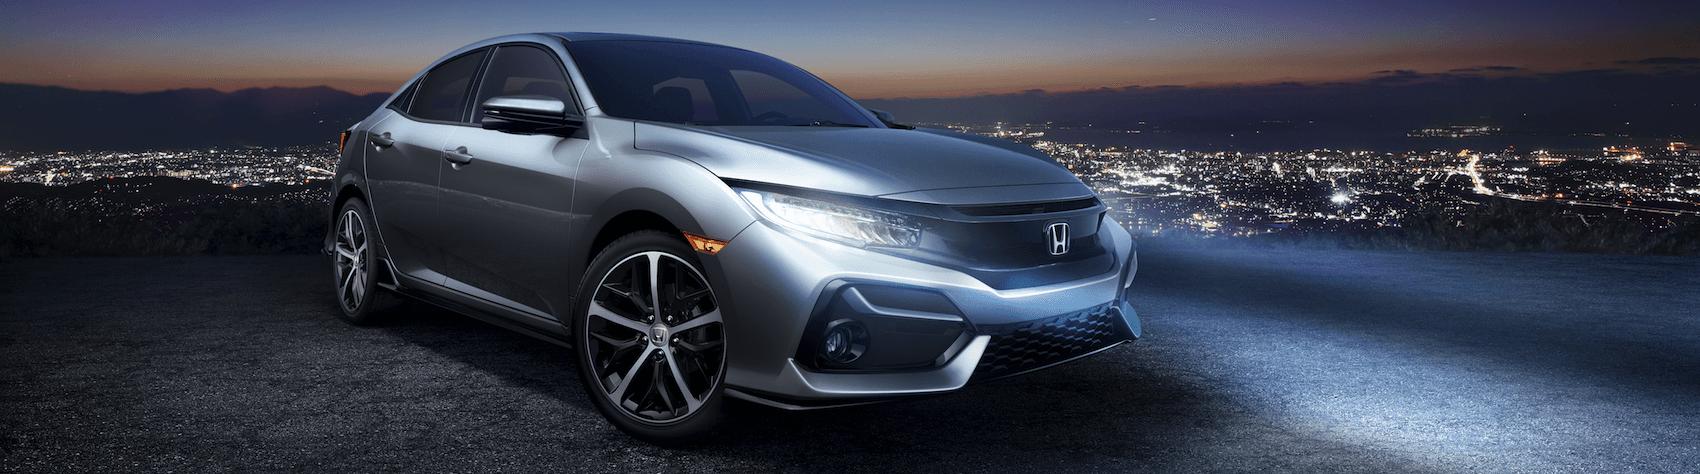 Honda Civic Financing